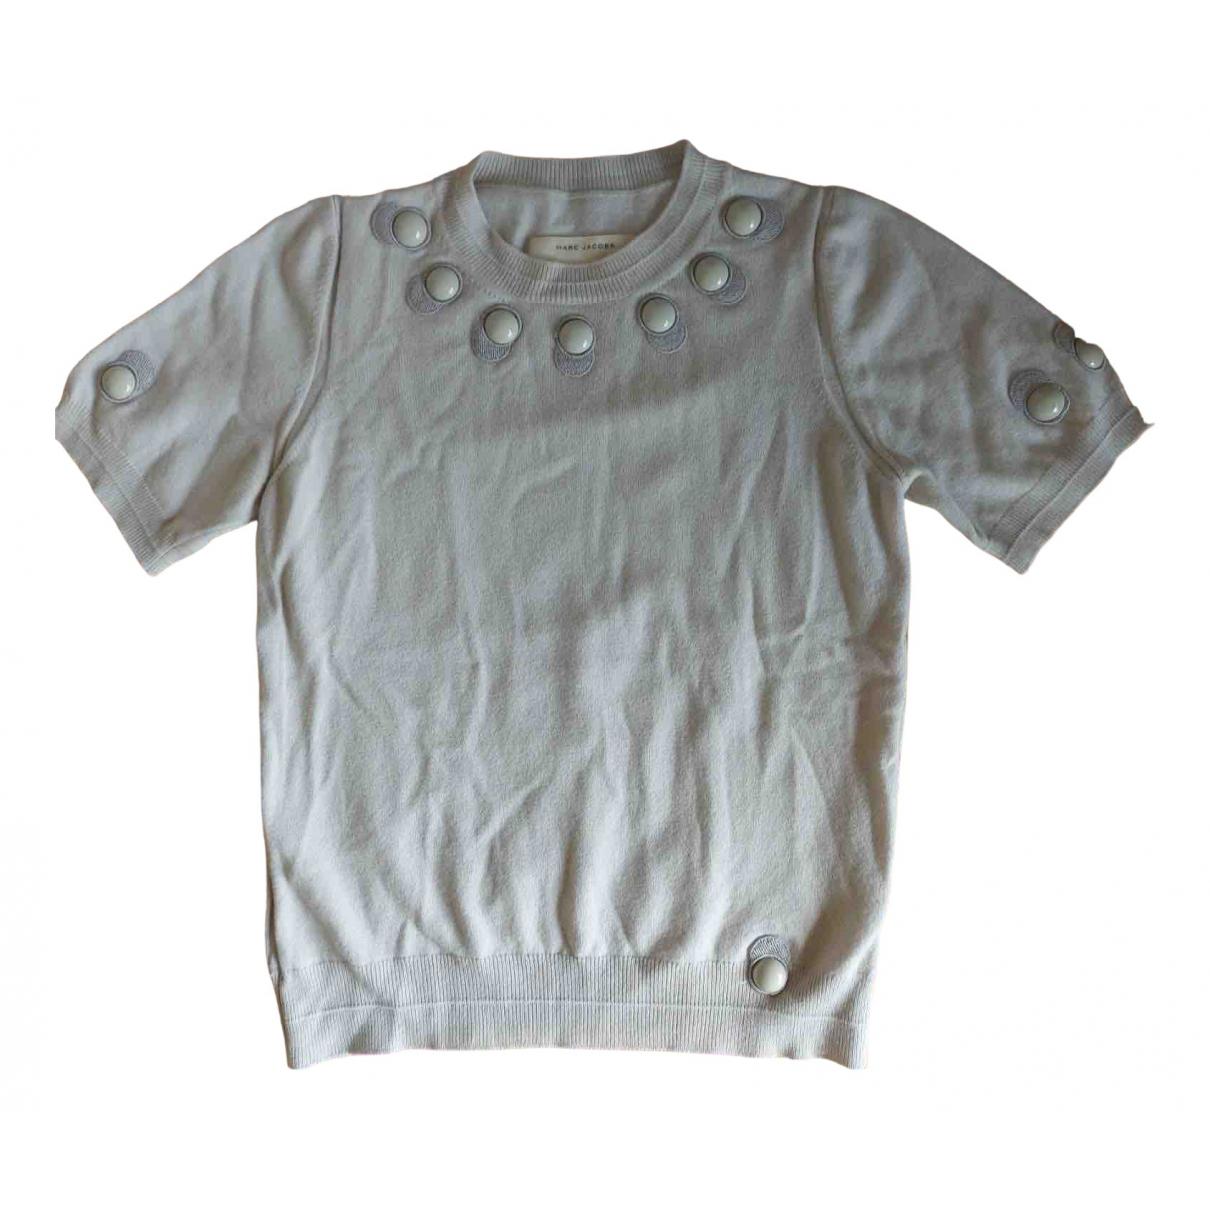 Camiseta de Lana Marc Jacobs